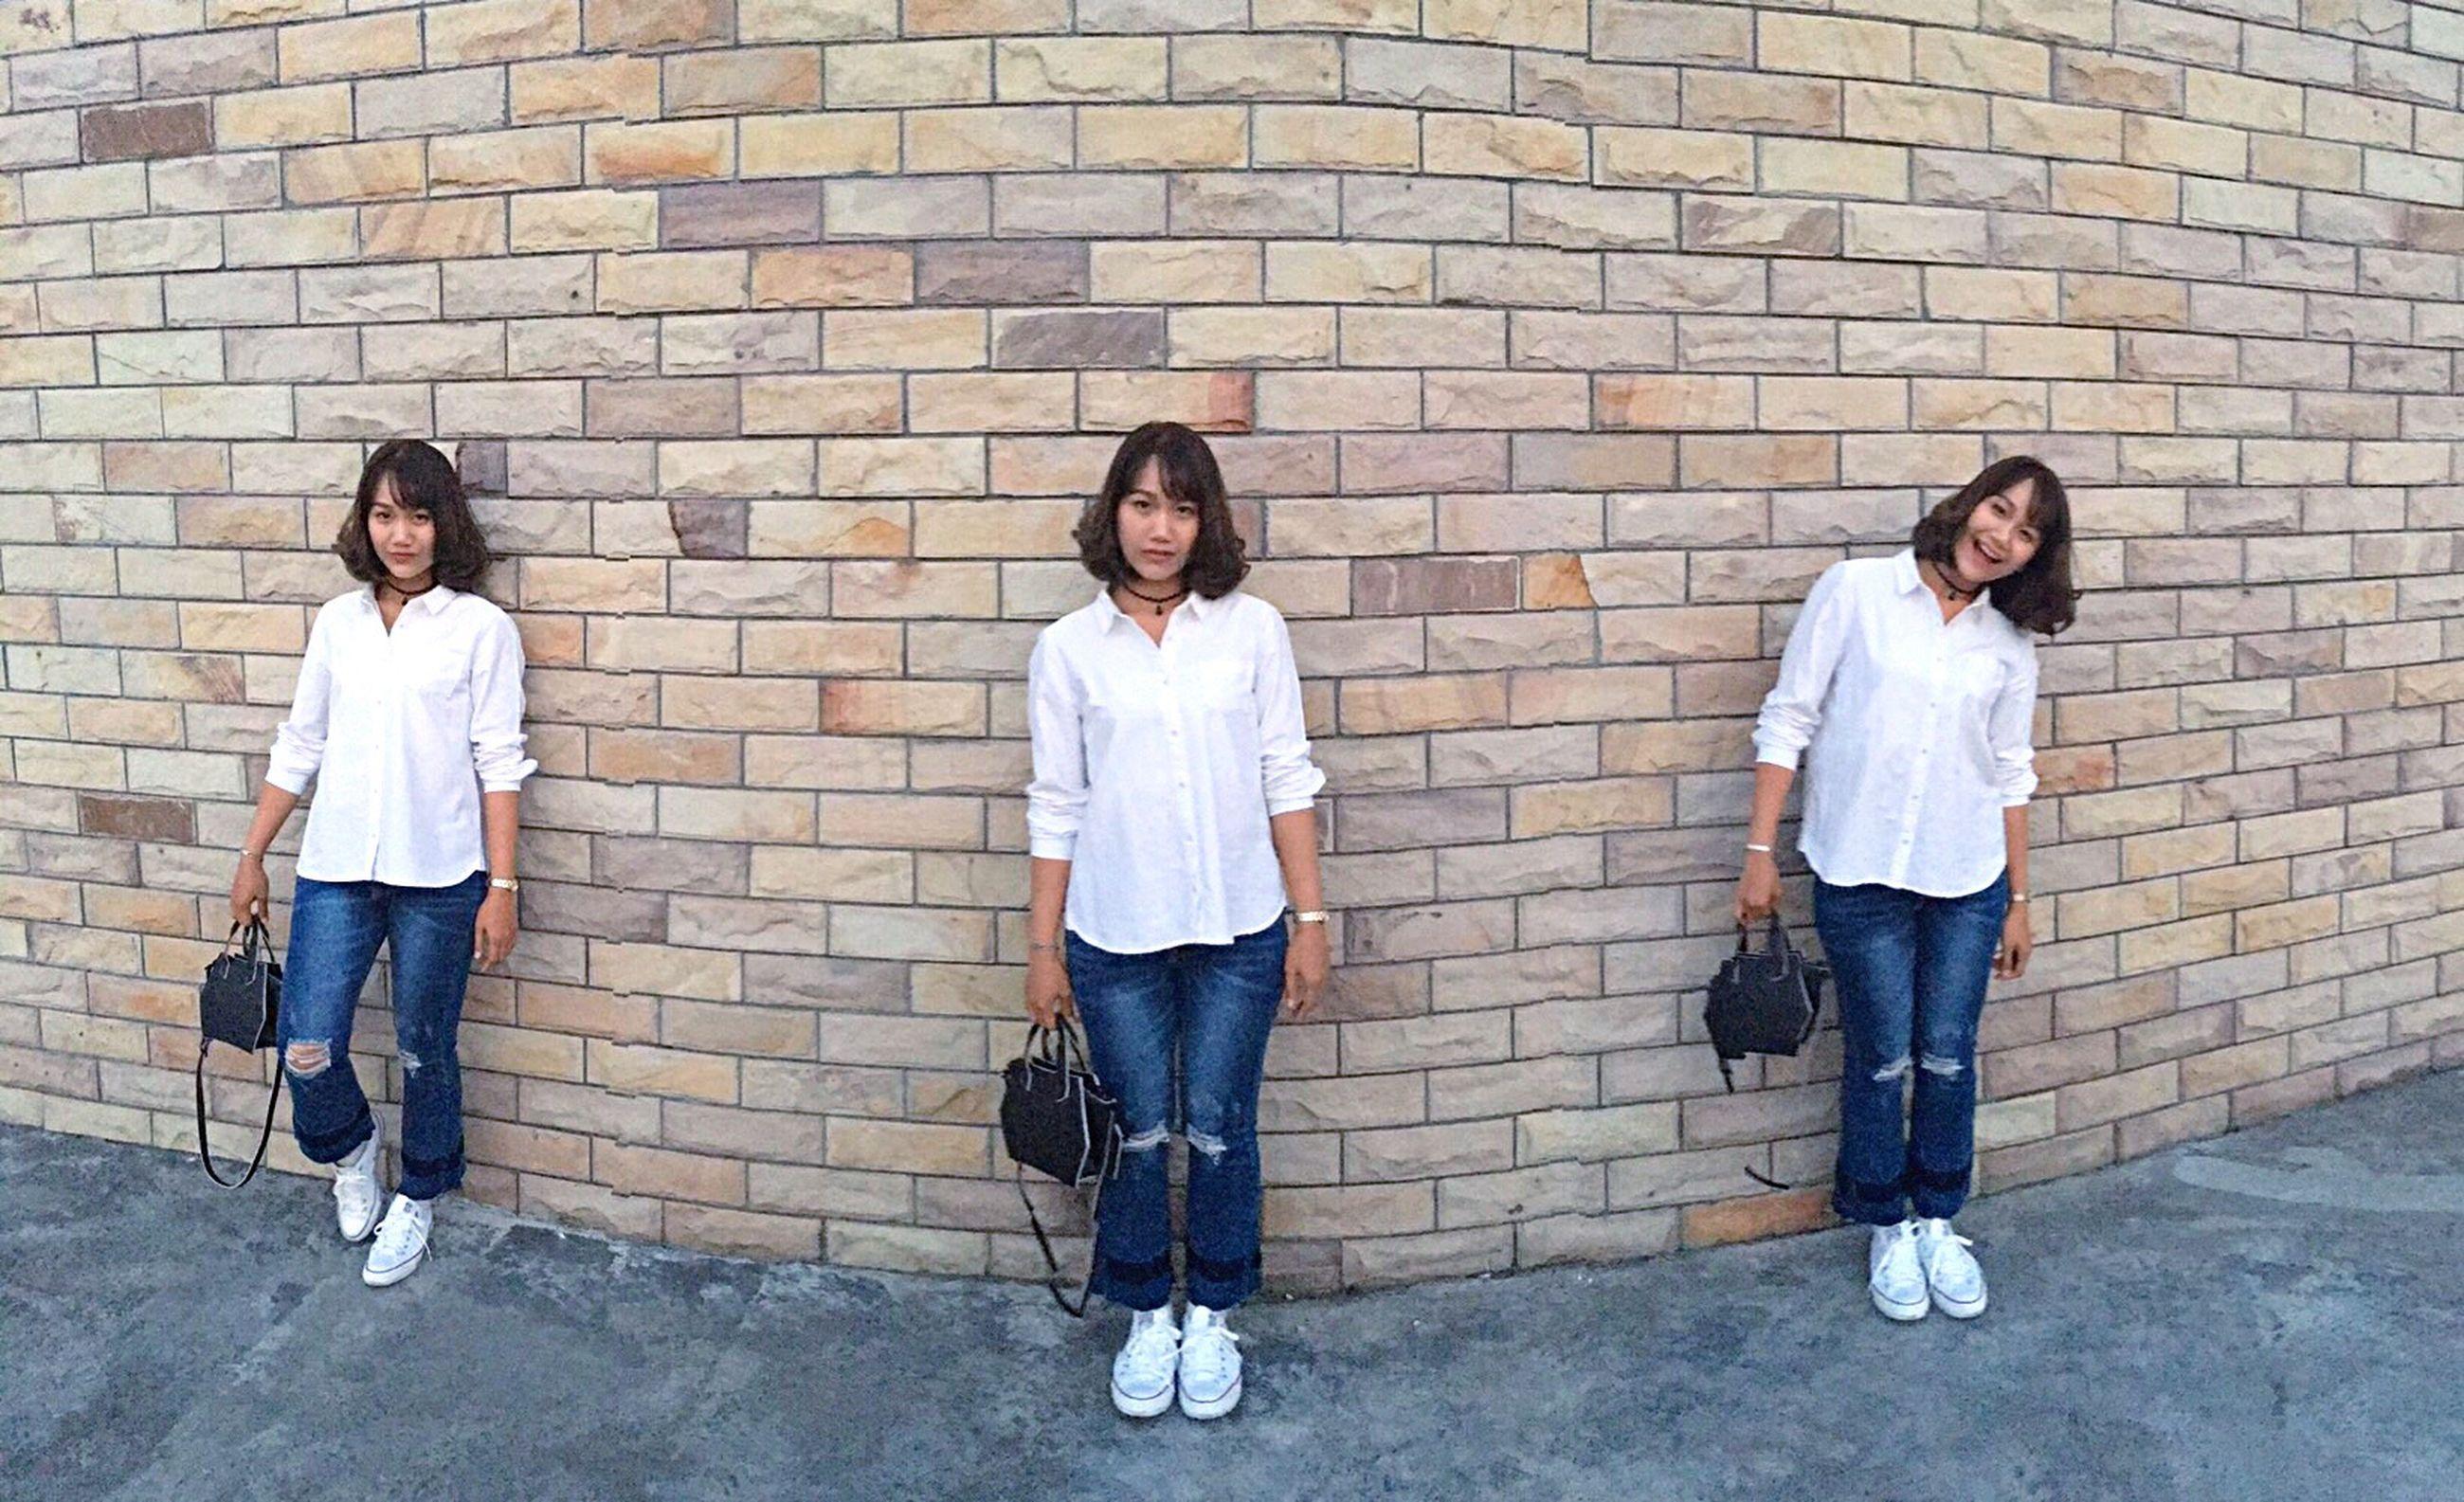 brick wall, child, boys, people, full length, outdoors, childhood, friendship, schoolyard, urban road, day